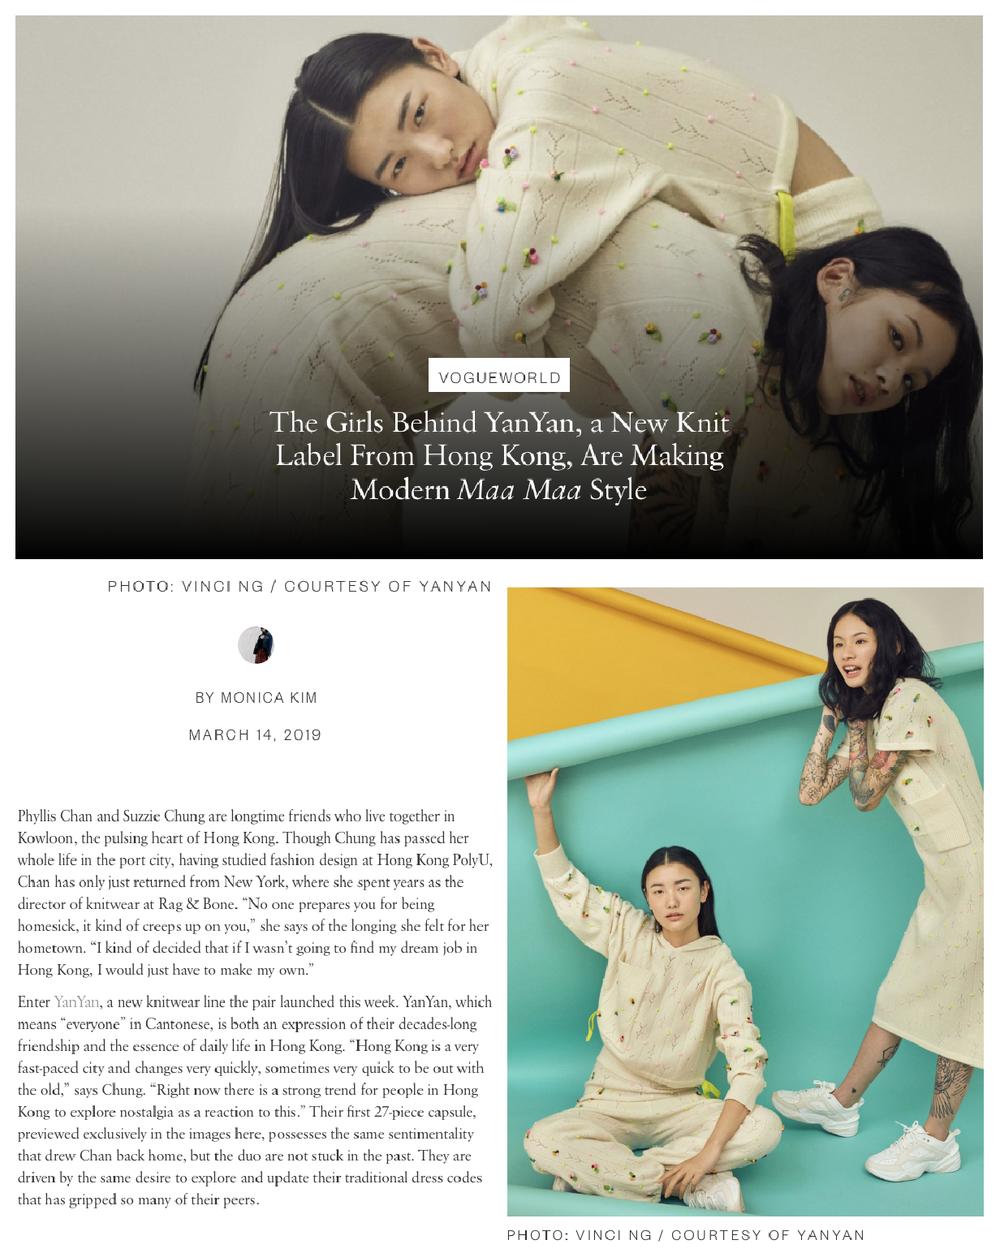 https://www.vogue.com/vogueworld/article/yanyan-hong-kong-sustainable-knitwear-label-launch